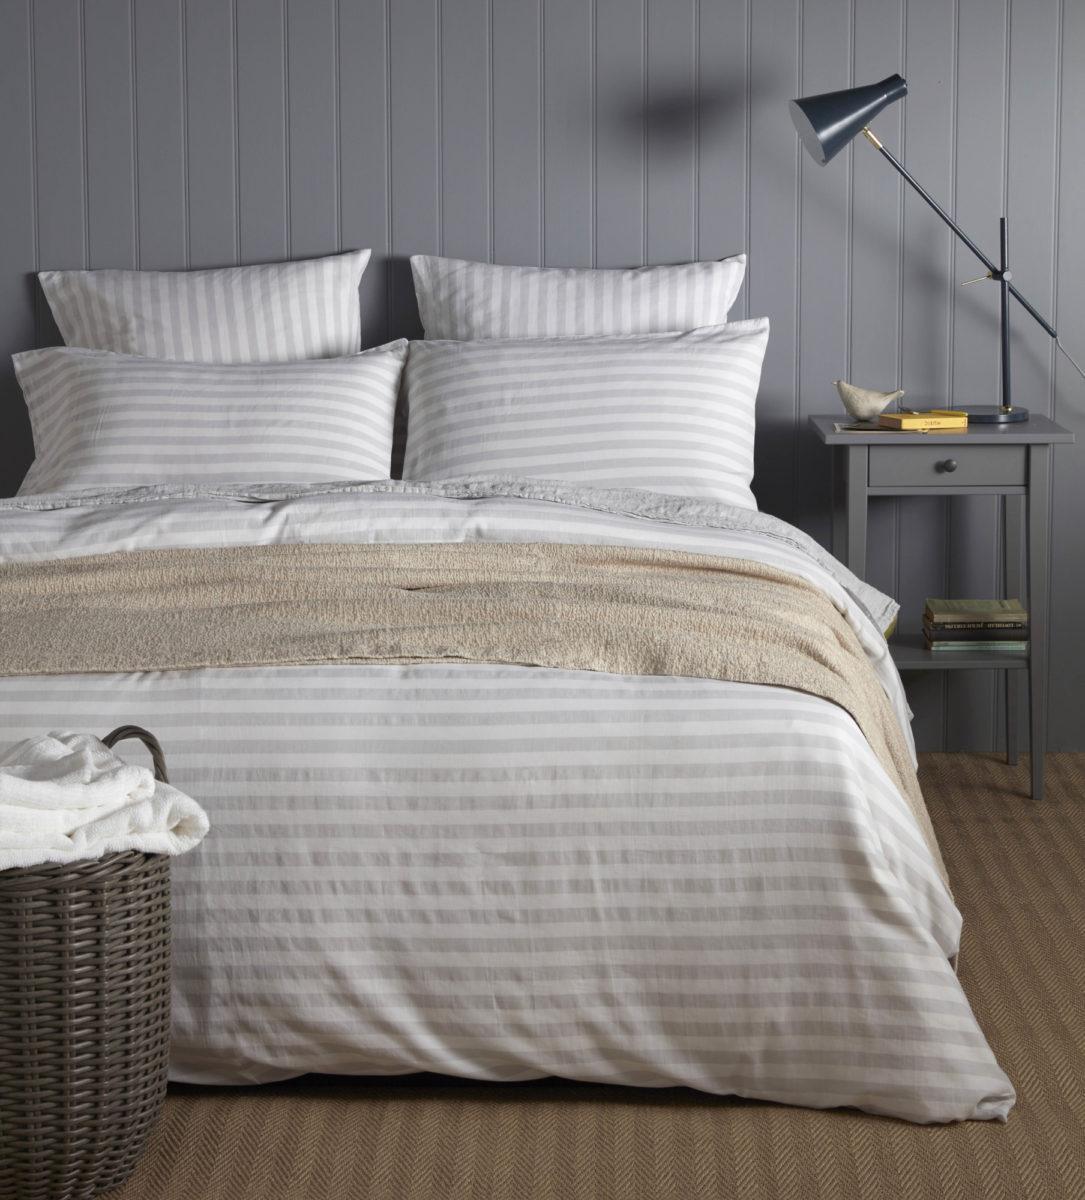 fdba3d3a3f Coastal Stripe 100% Cotton Pebble Grey Bedding | Secret Linen Store